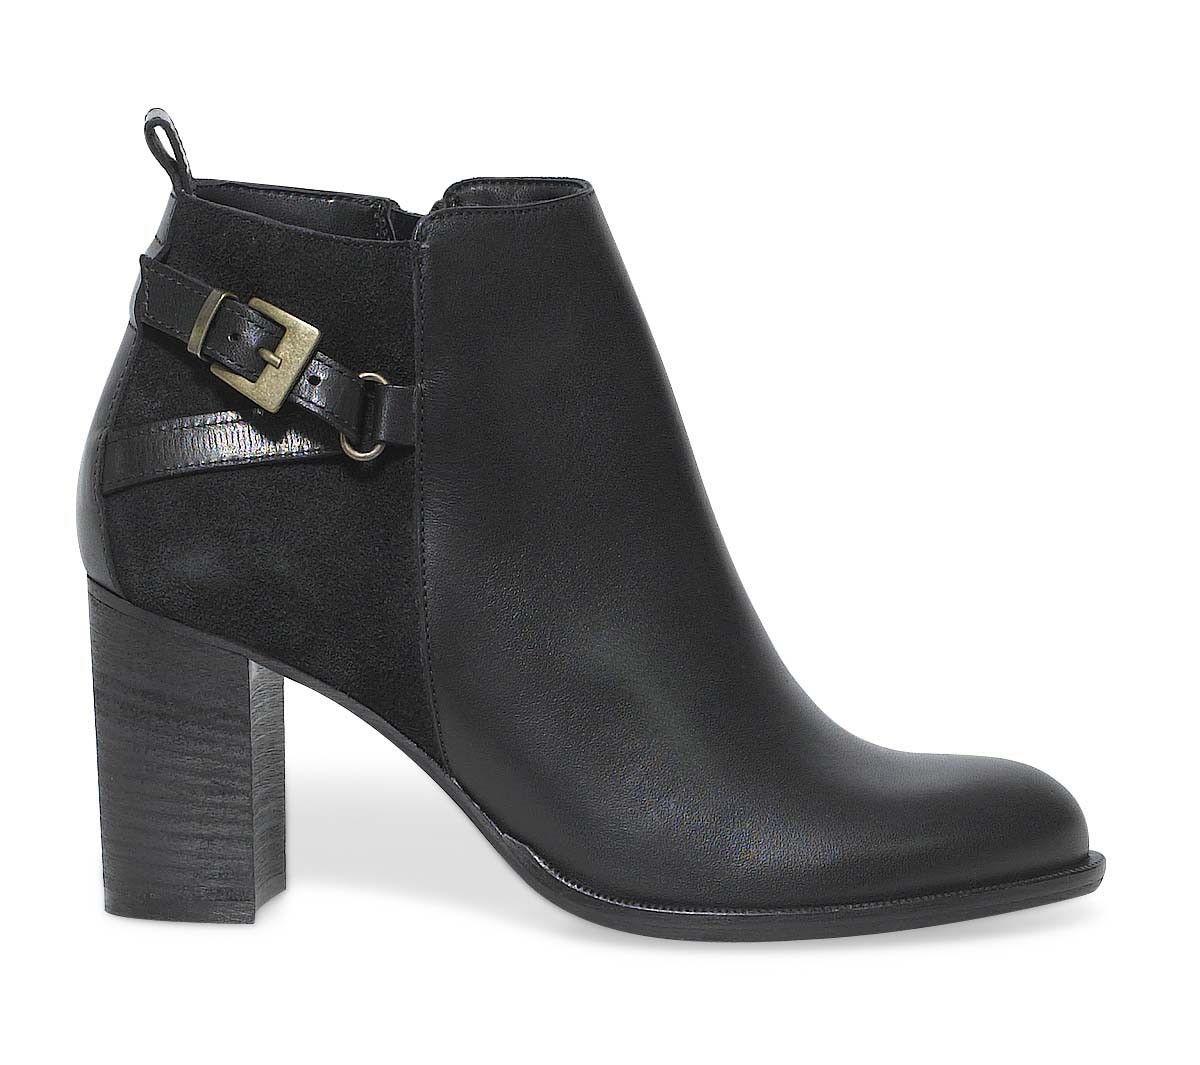 boots talon noir boots bottines chaussures femme. Black Bedroom Furniture Sets. Home Design Ideas